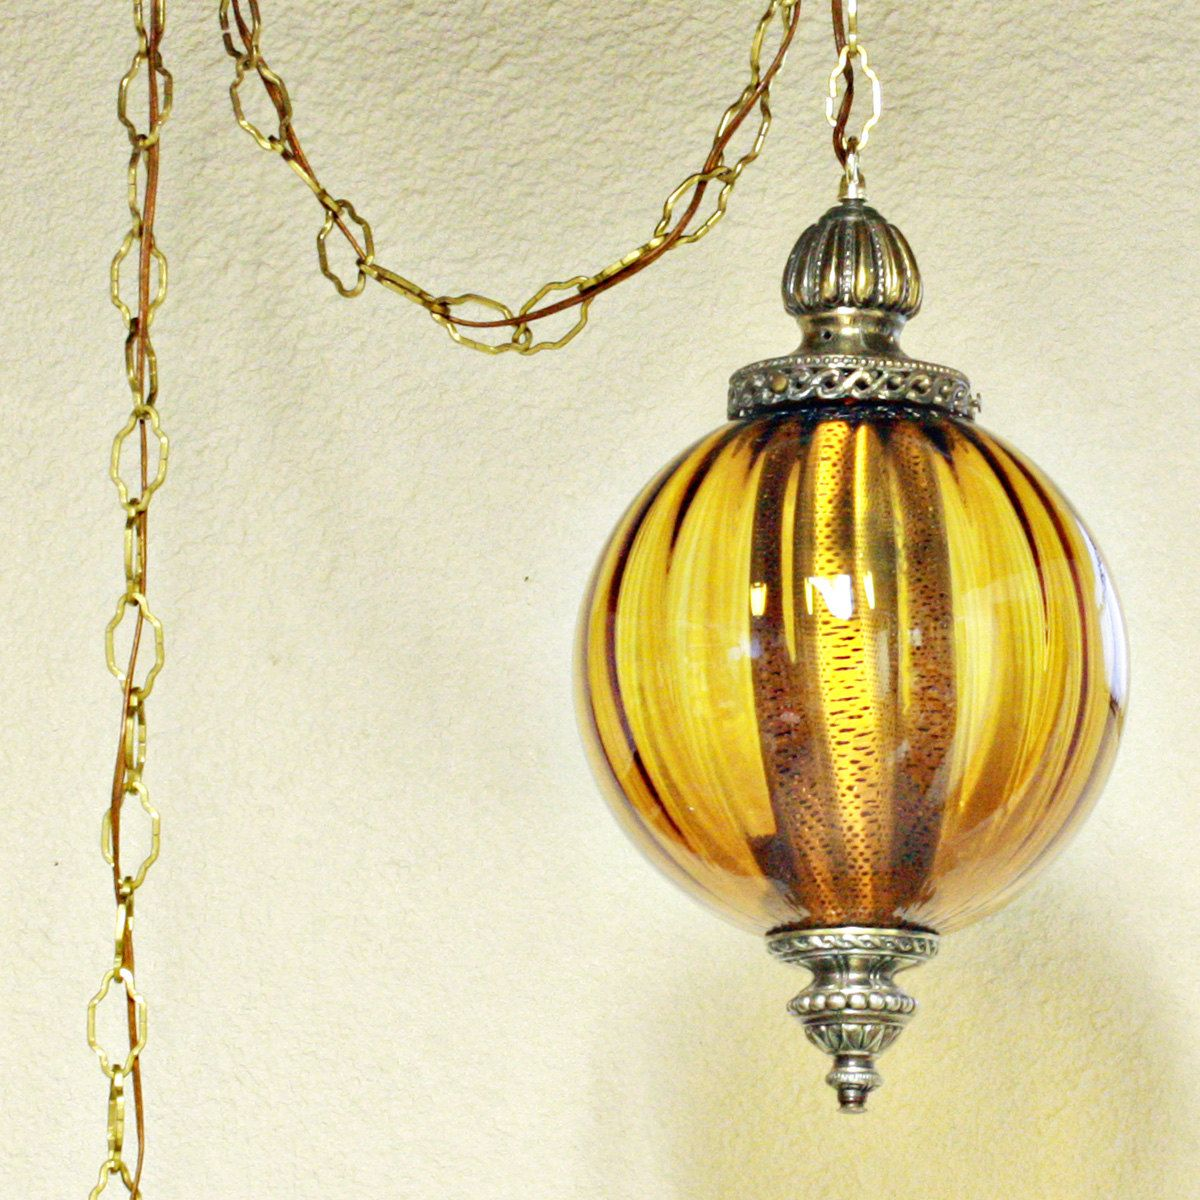 vintage hanging light swag lamp hanging lamp amber globe chain cord pendant light orange